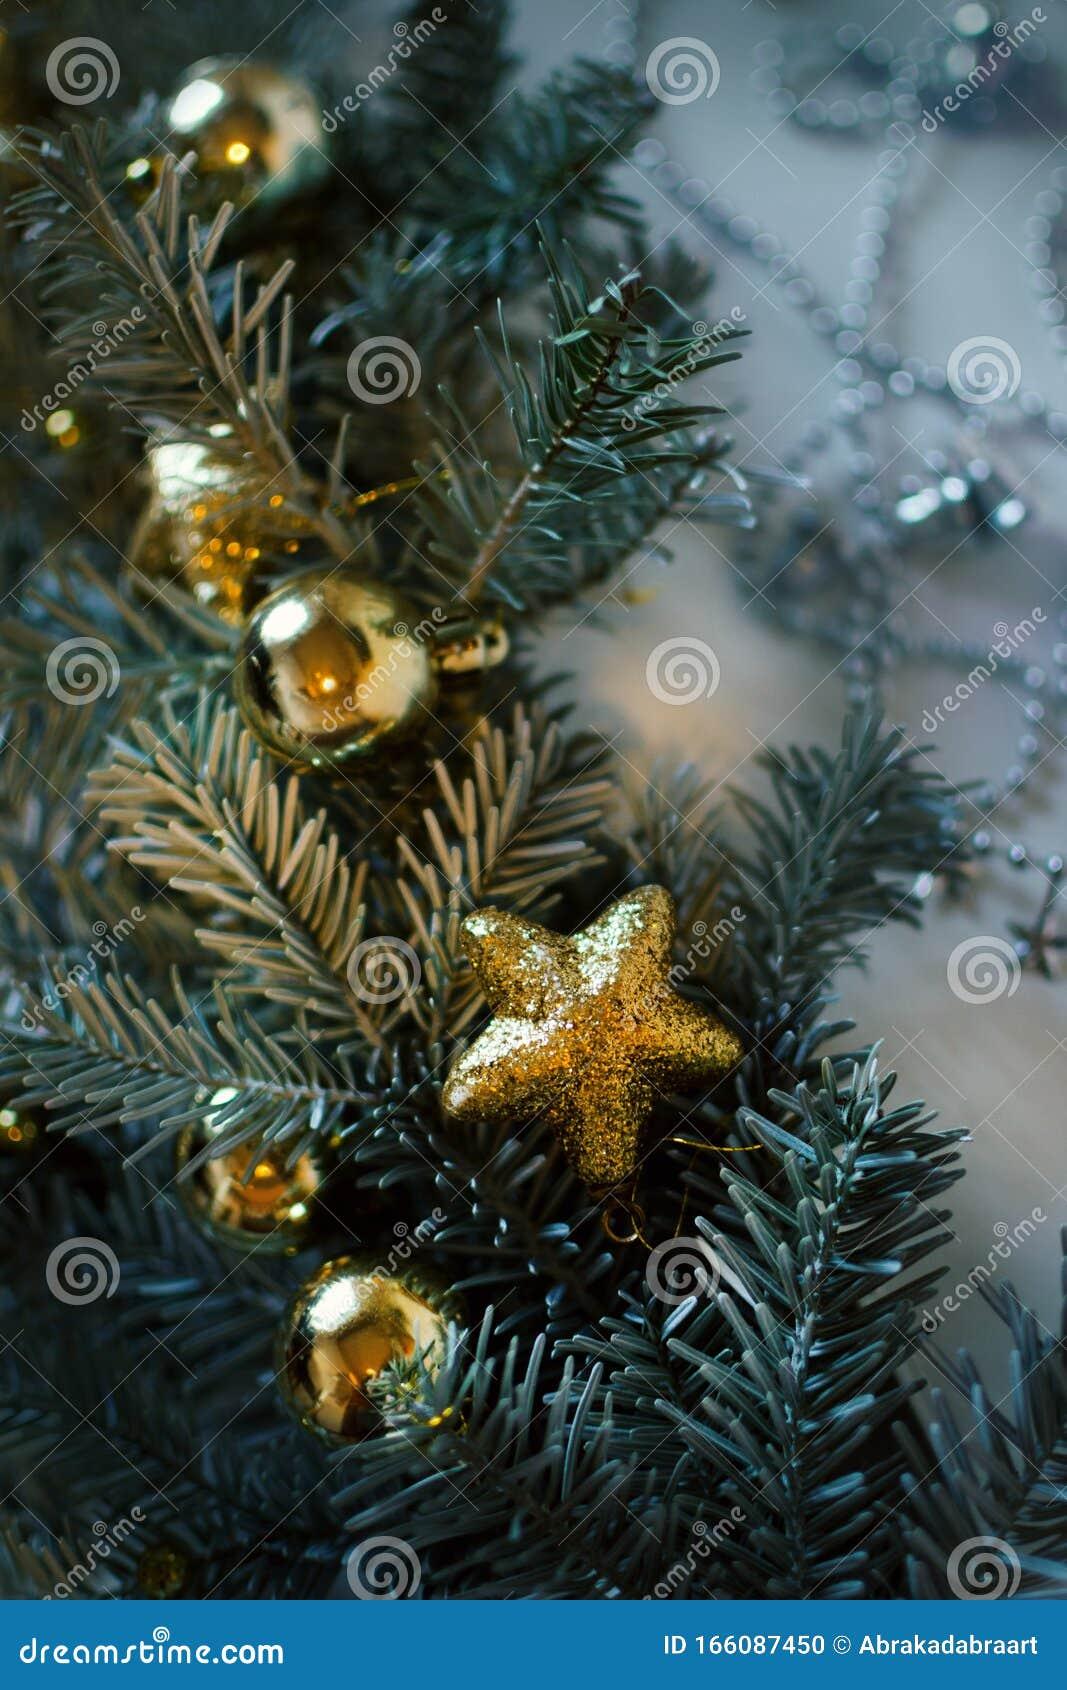 Christmas Tree Decor With Golden Ornaments Stock Photo Image Of Christmas Decor 166087450